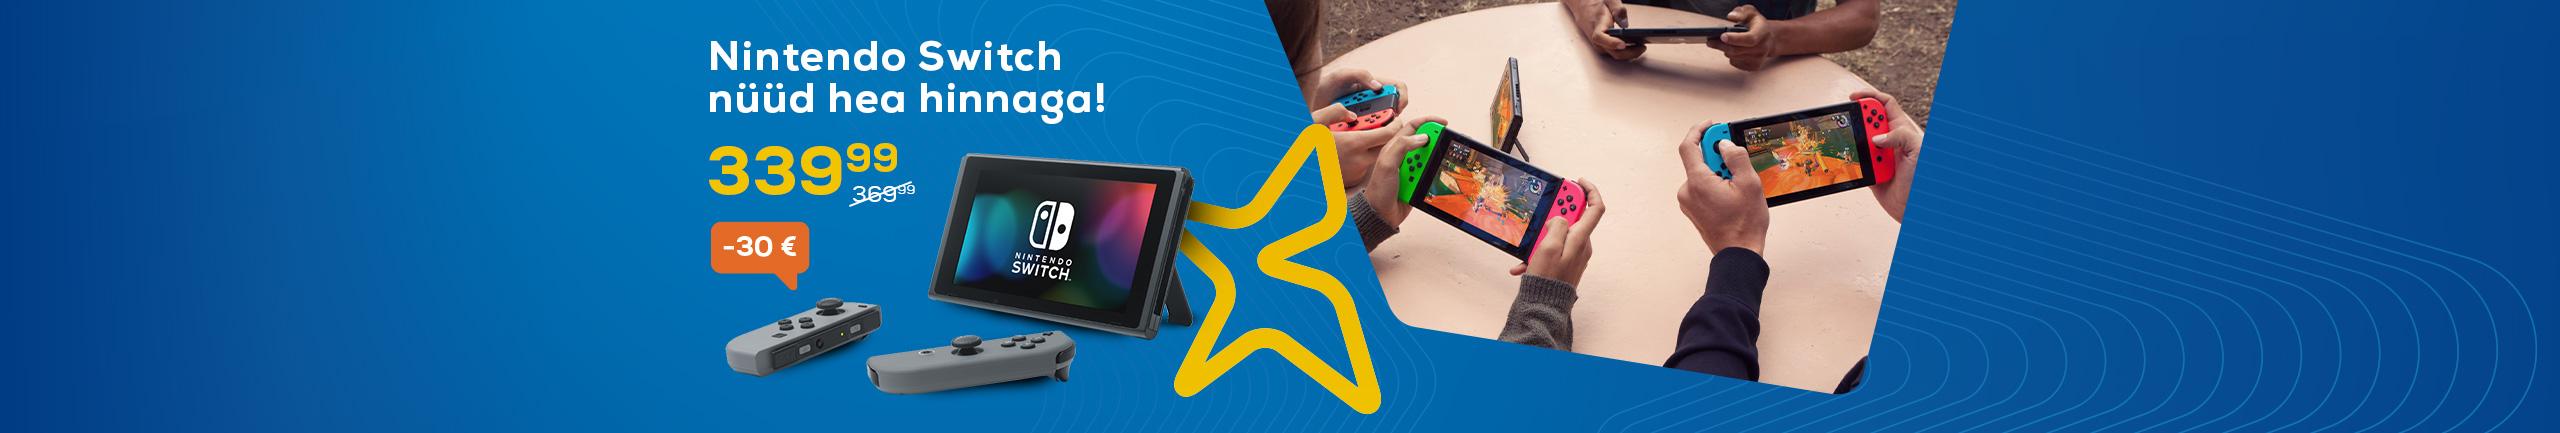 Nintendo Switch sale!